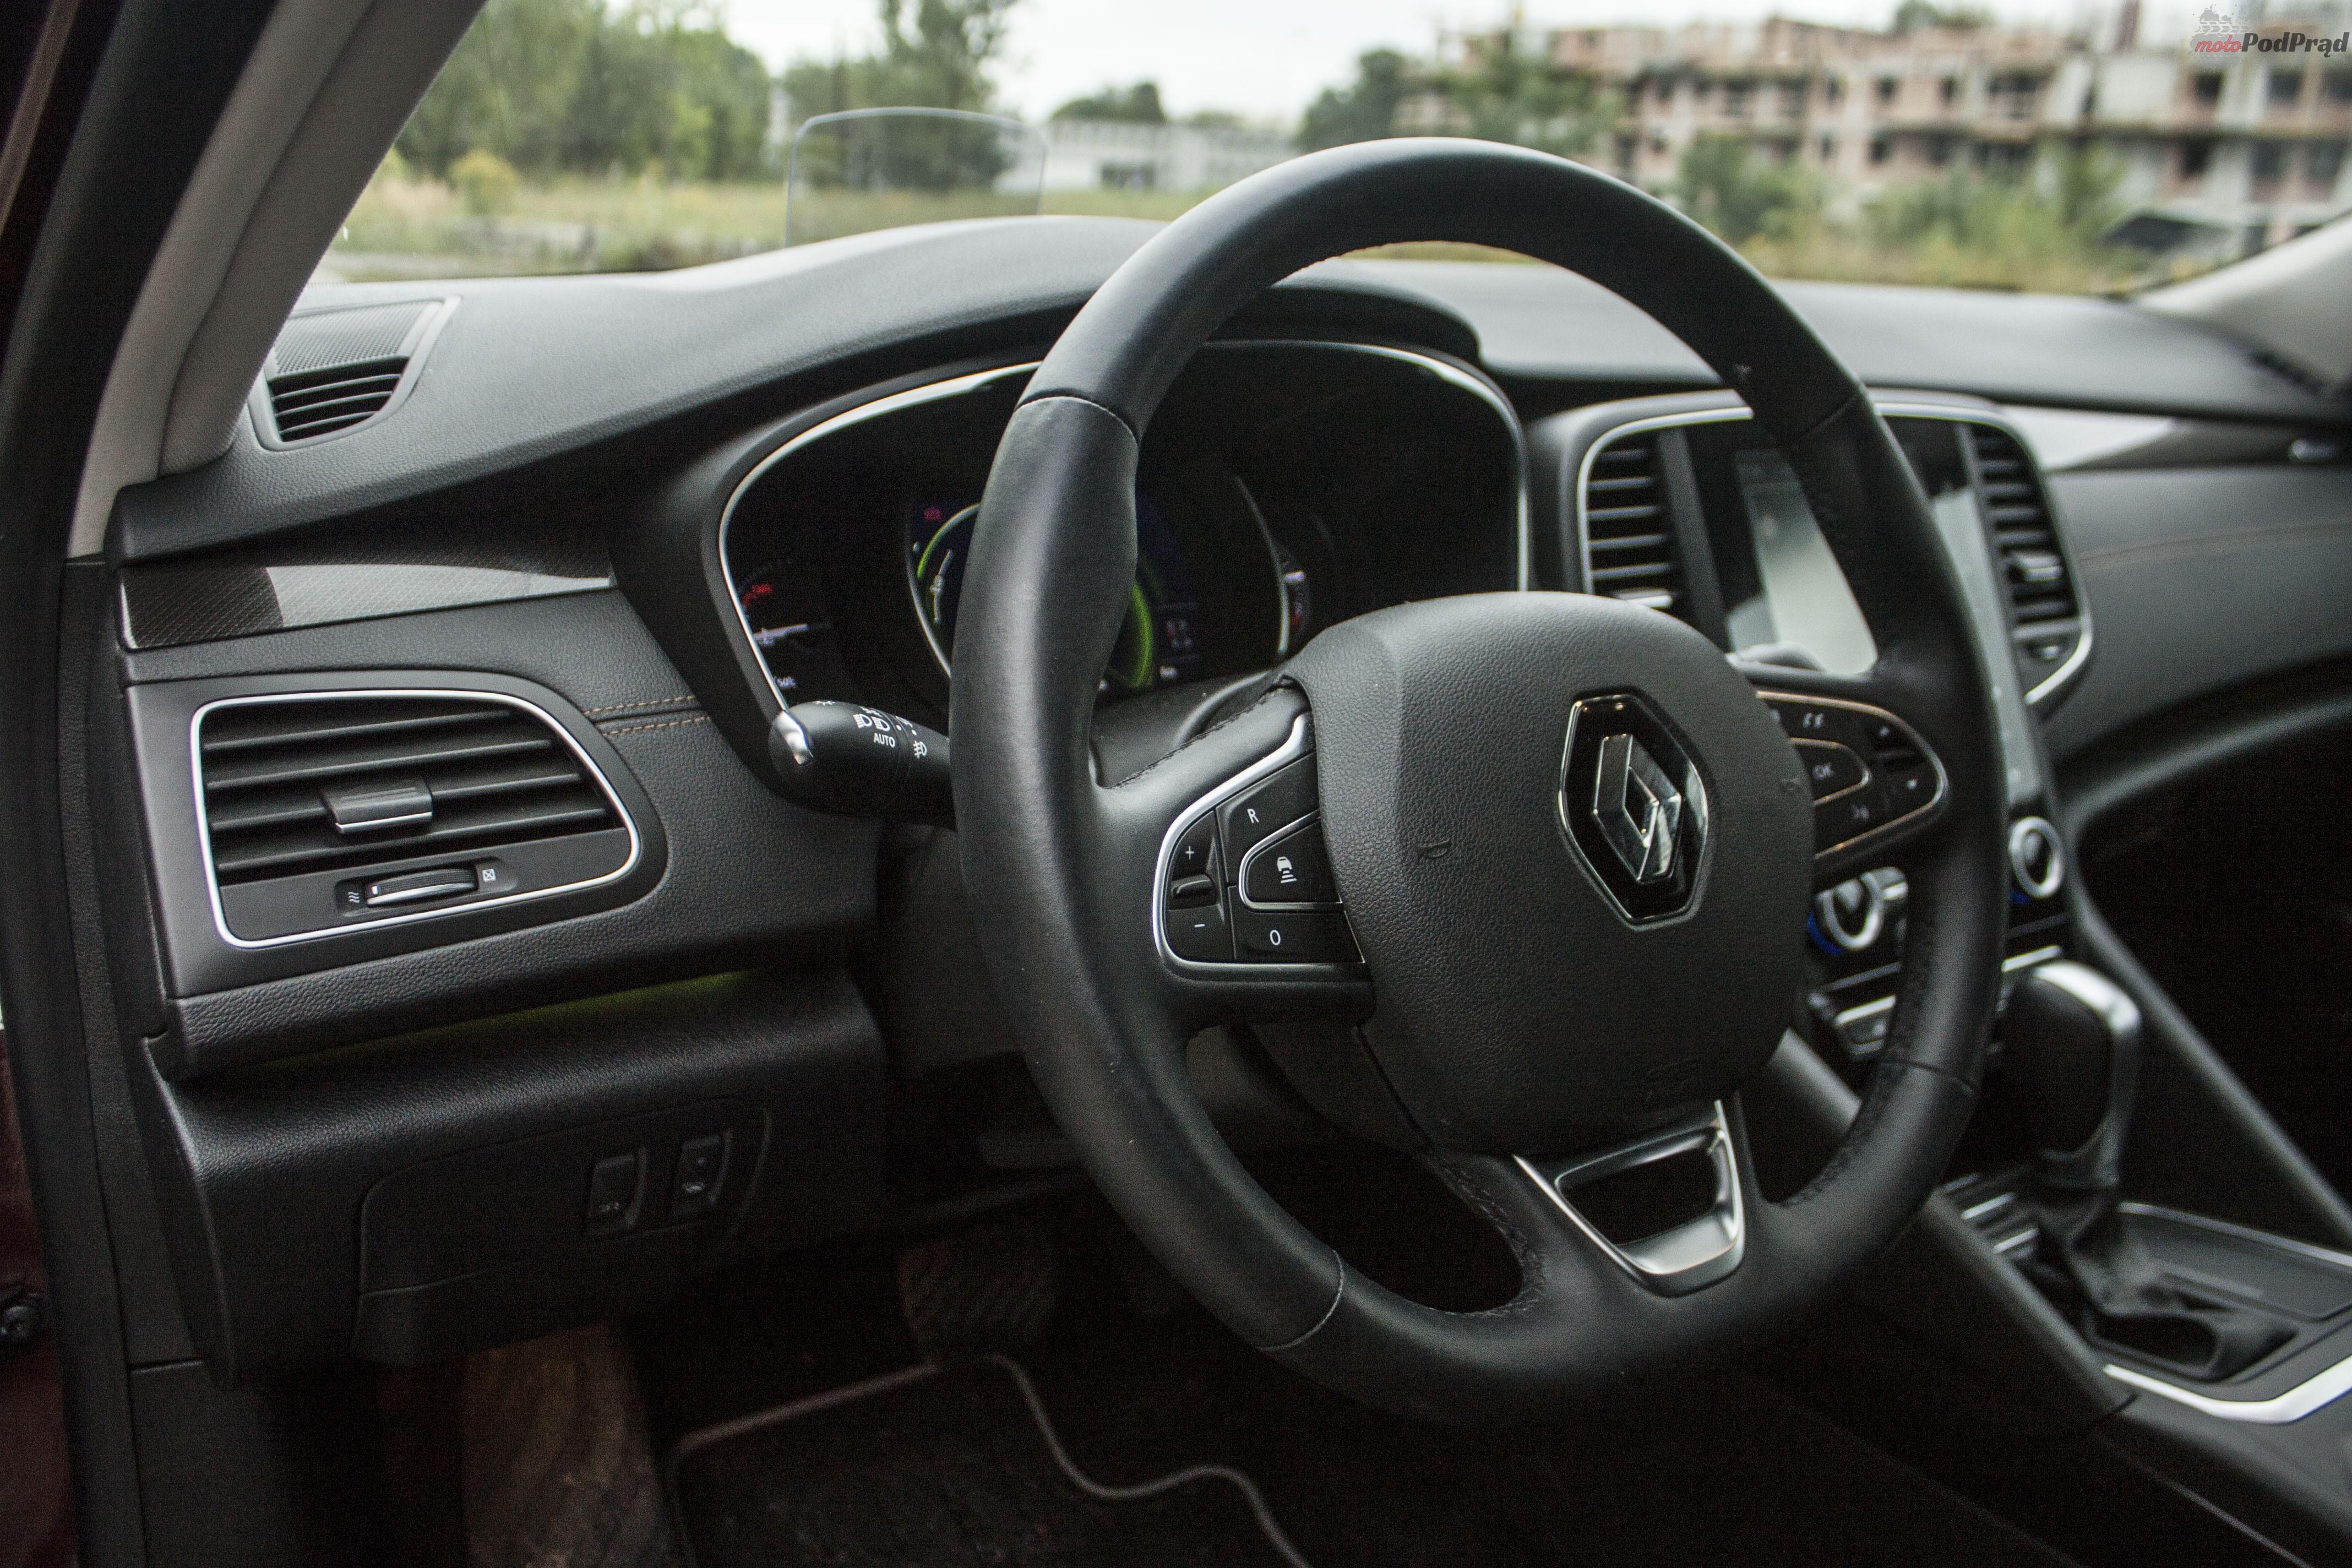 Renault Talisman 12 Test: Renault Talisman Grandtour 1.6 dCi 130 KM   kompan w podróży